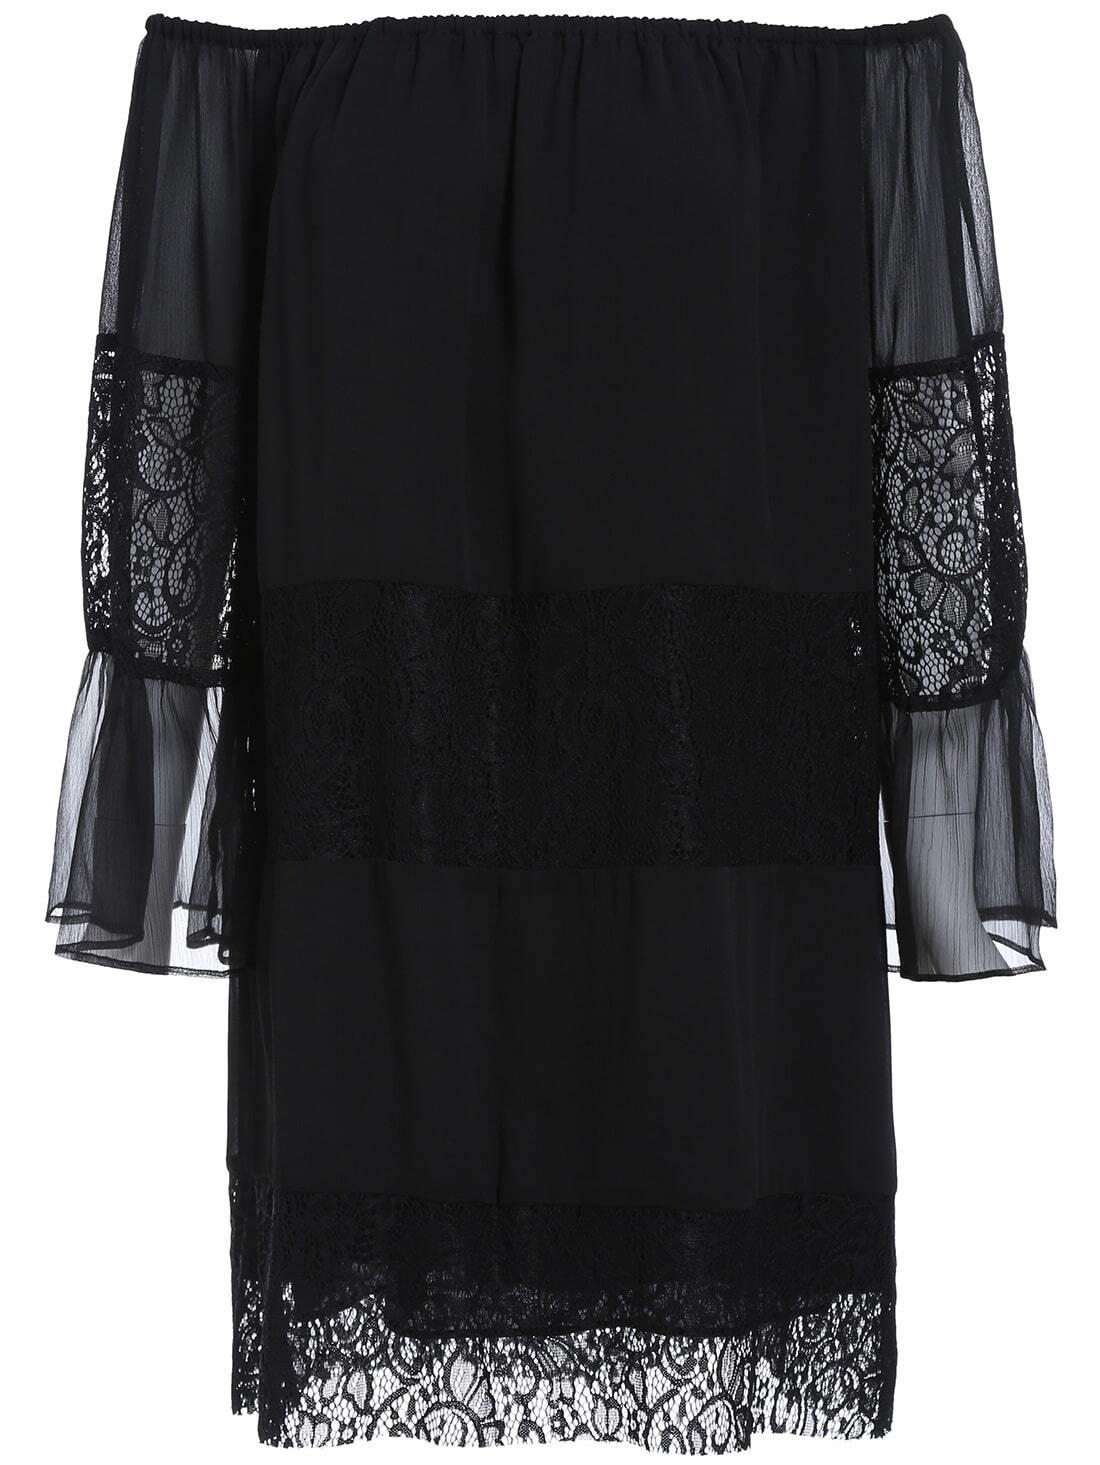 Black Boat Neck Sheer Mesh Lace Dress